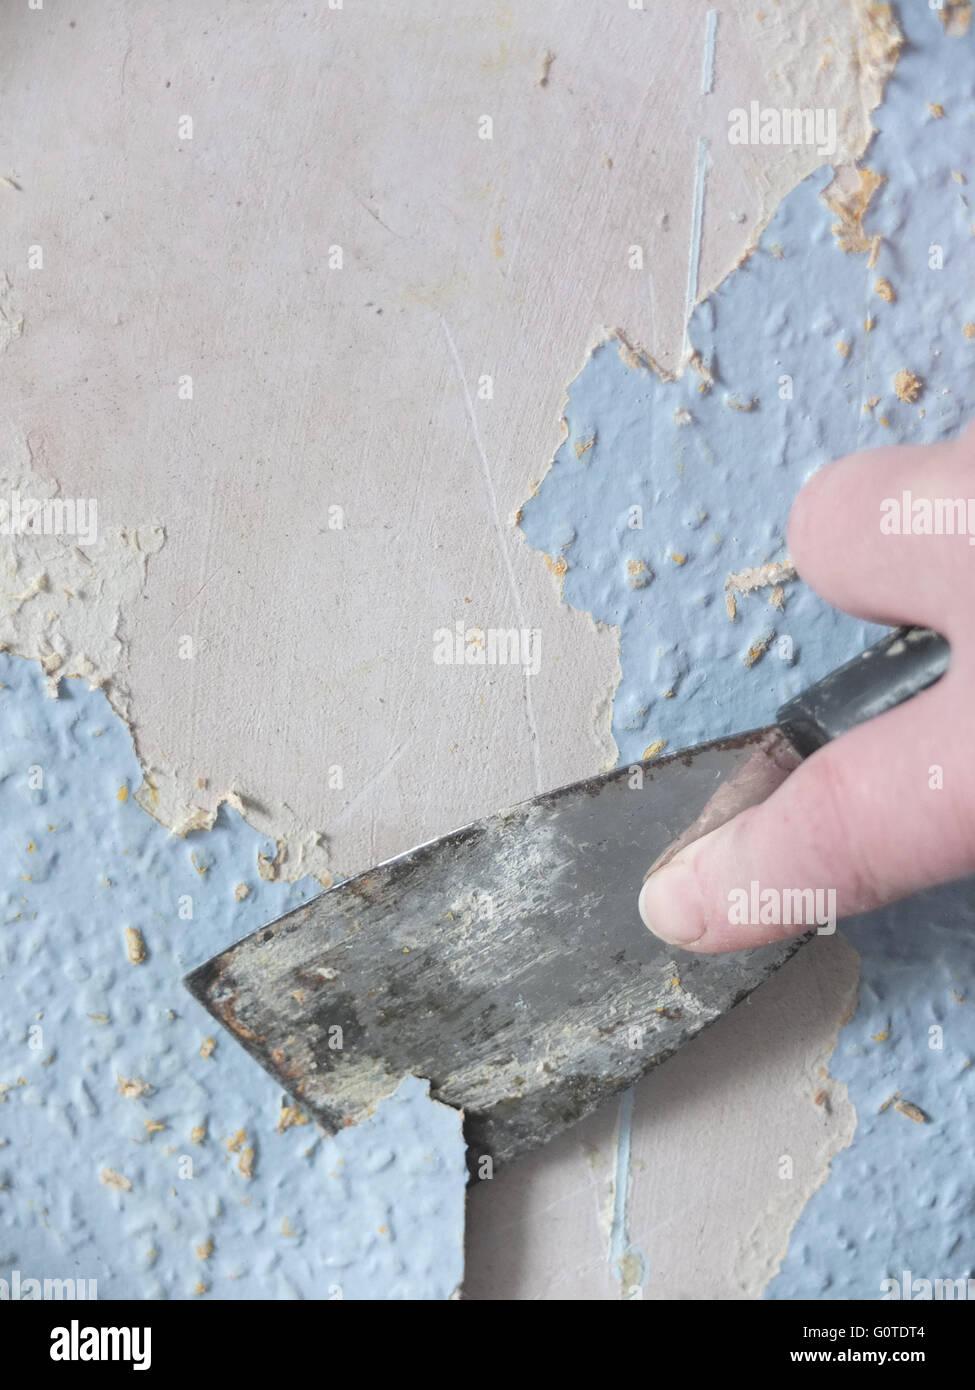 Carta Da Parati Su Muro Ruvido.La Raschiatura Applicazione Su Carta Da Parati Ruvida Su Un Muro